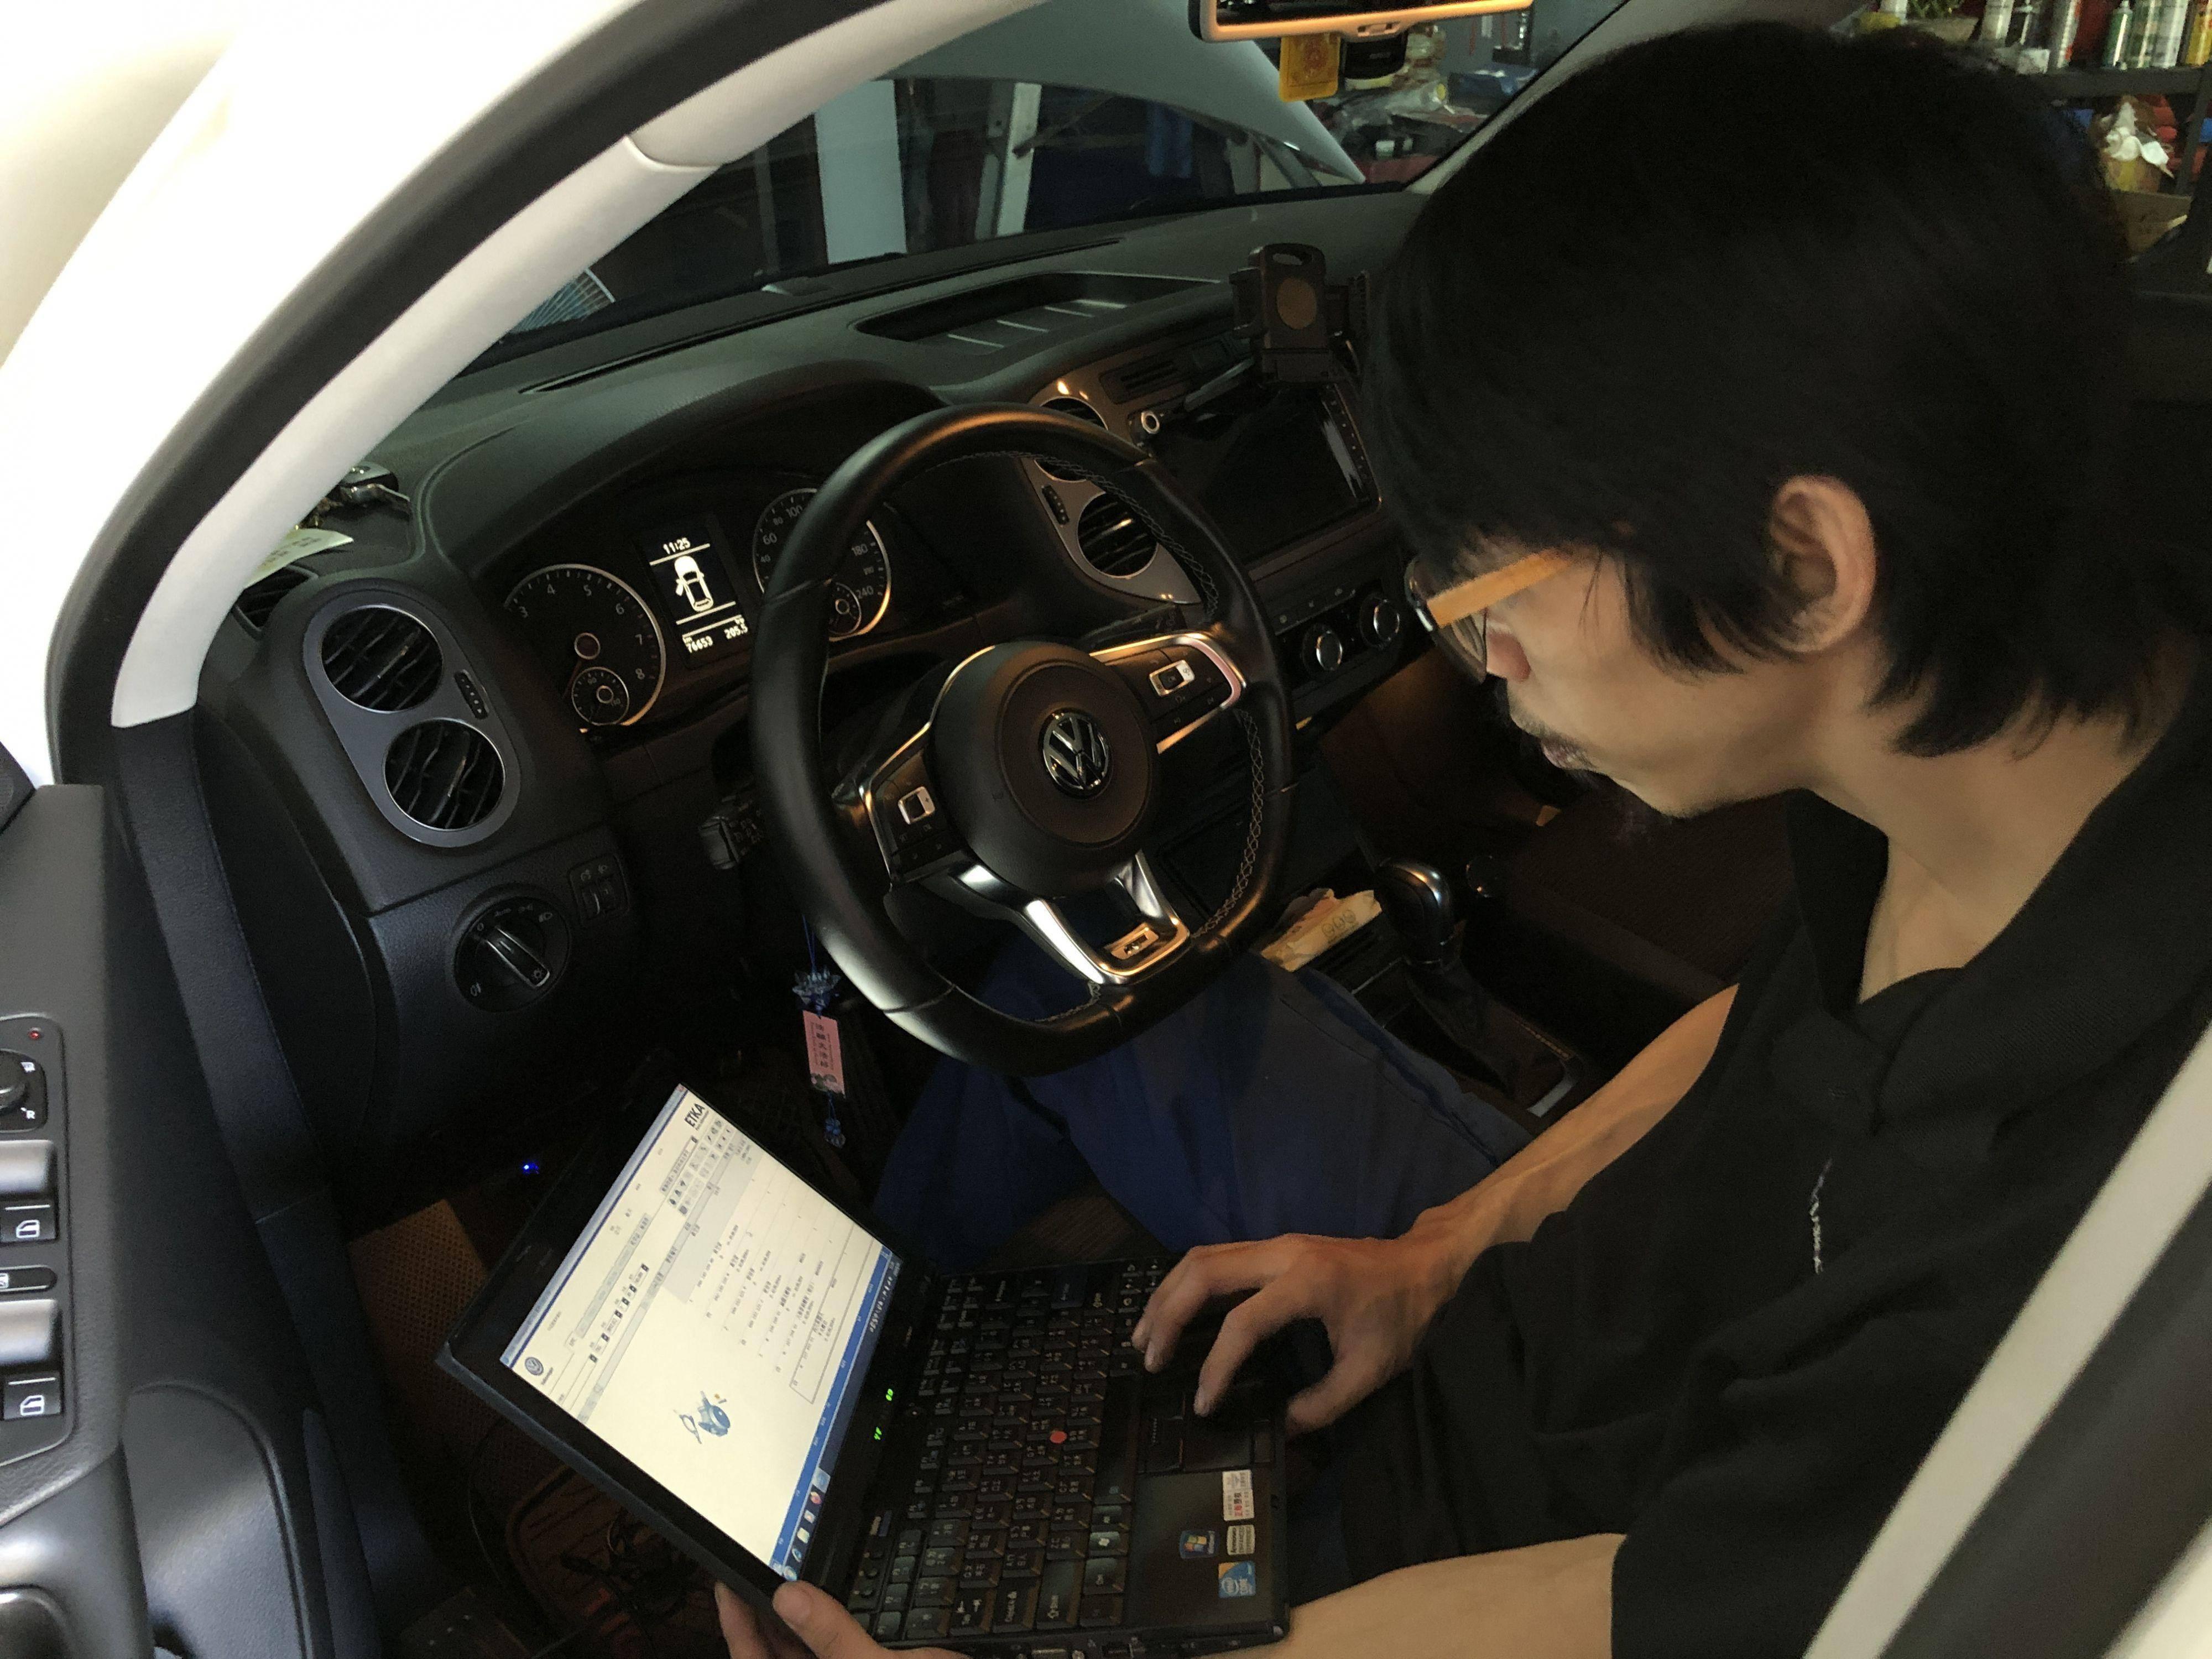 GOLF車輛系統故障問題,原廠電腦診斷查修情況。